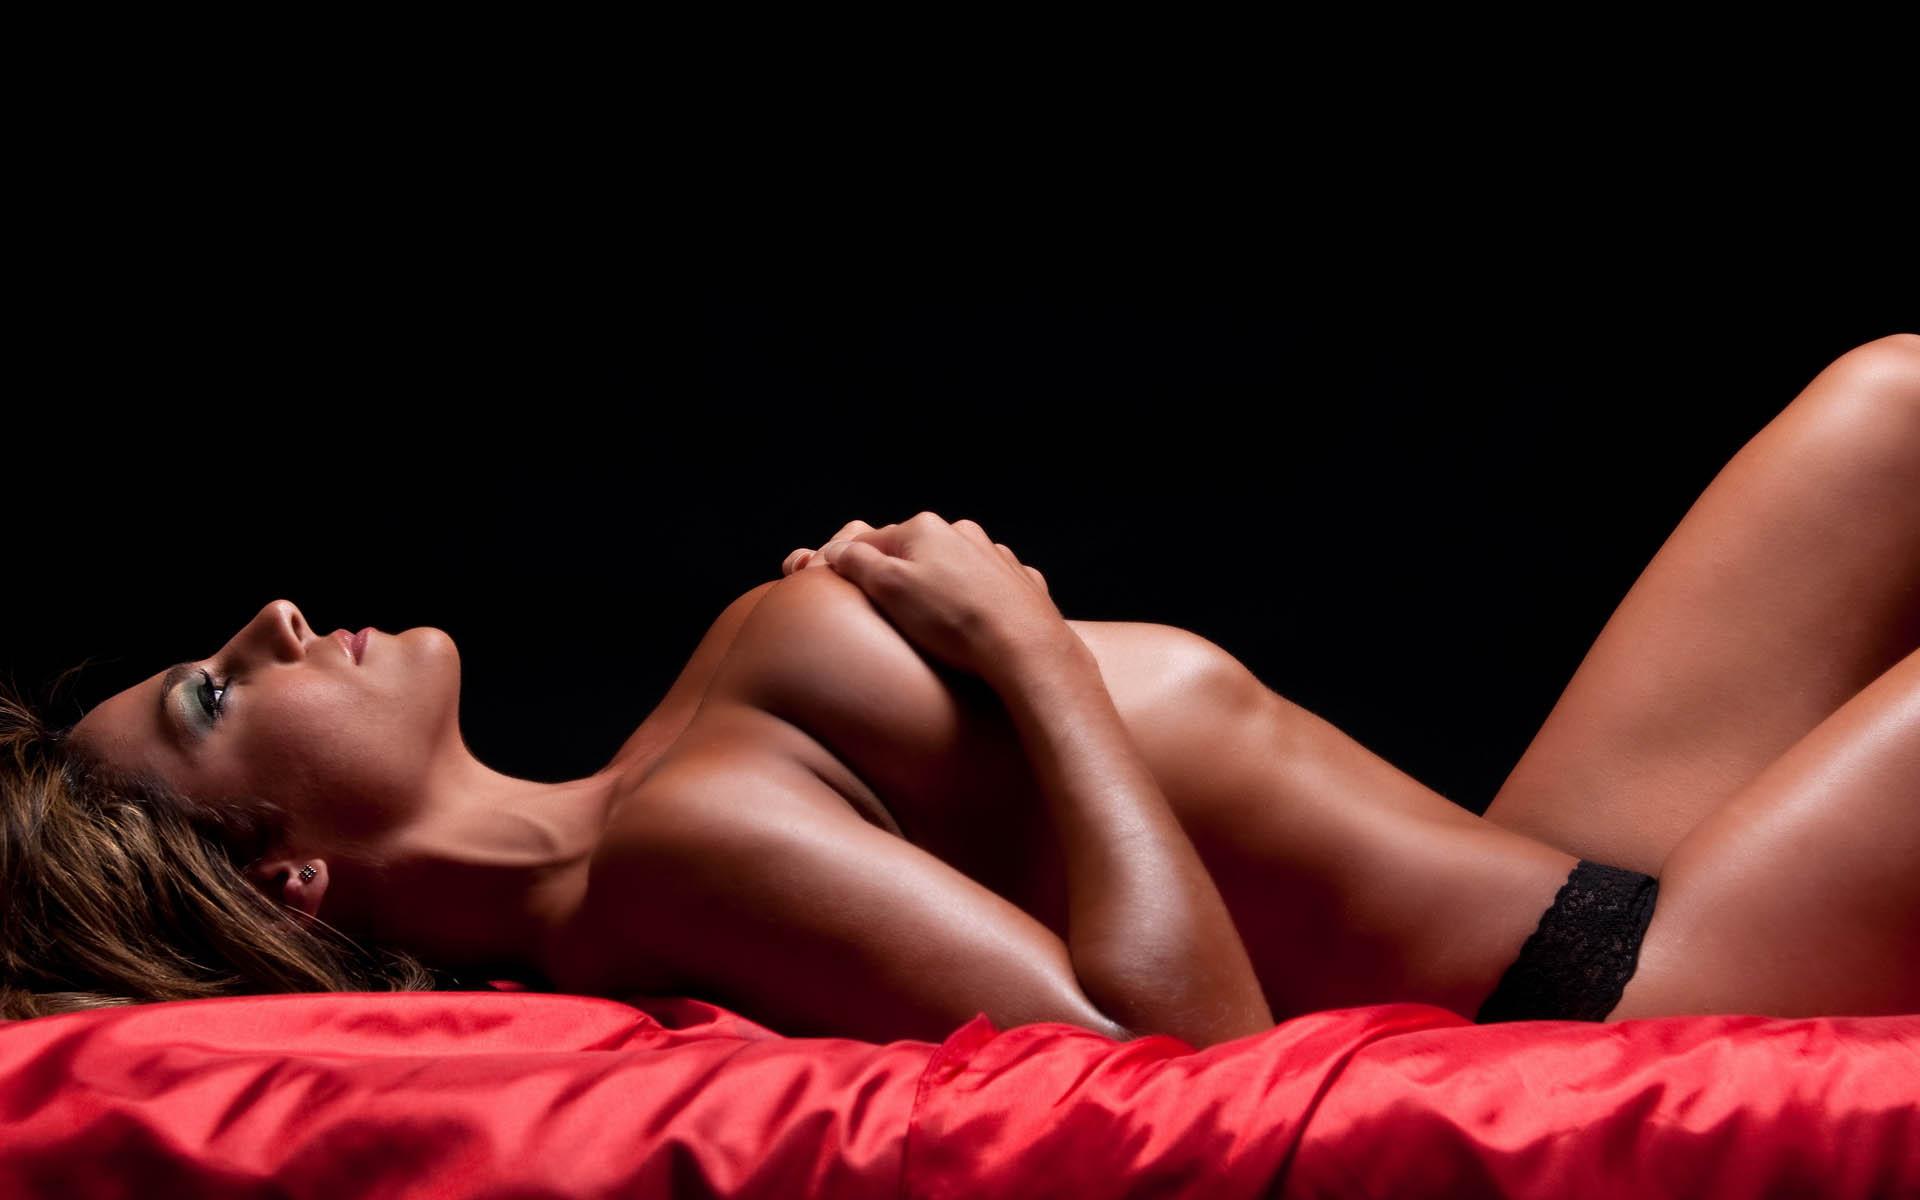 Секс женщин коже 16 фотография